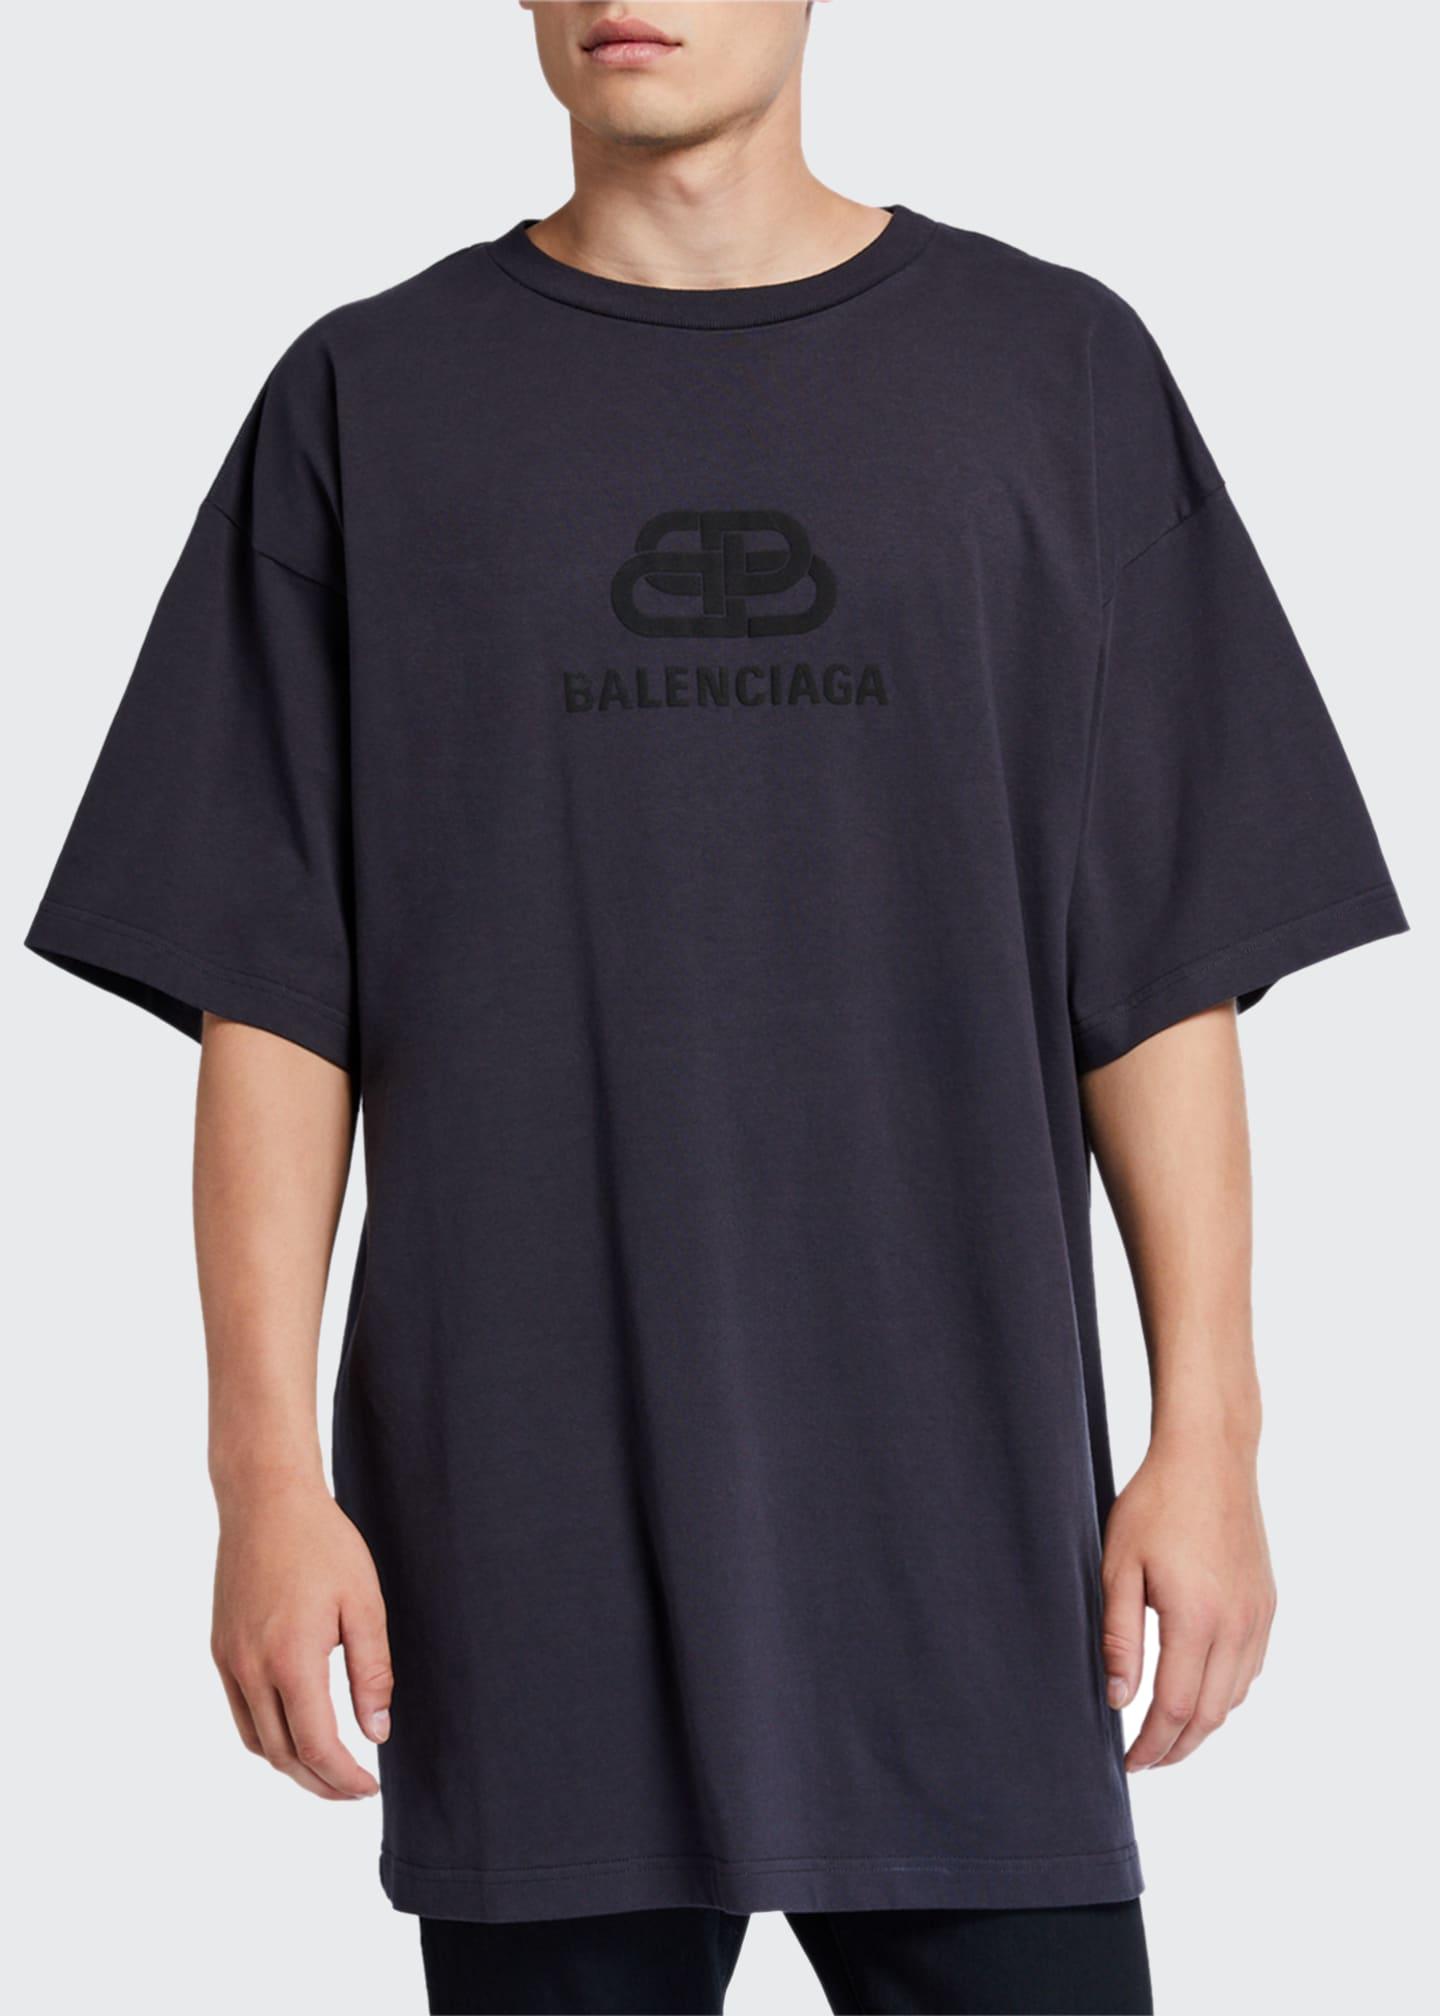 Balenciaga Men's Oversized Washed BB Logo T-Shirt